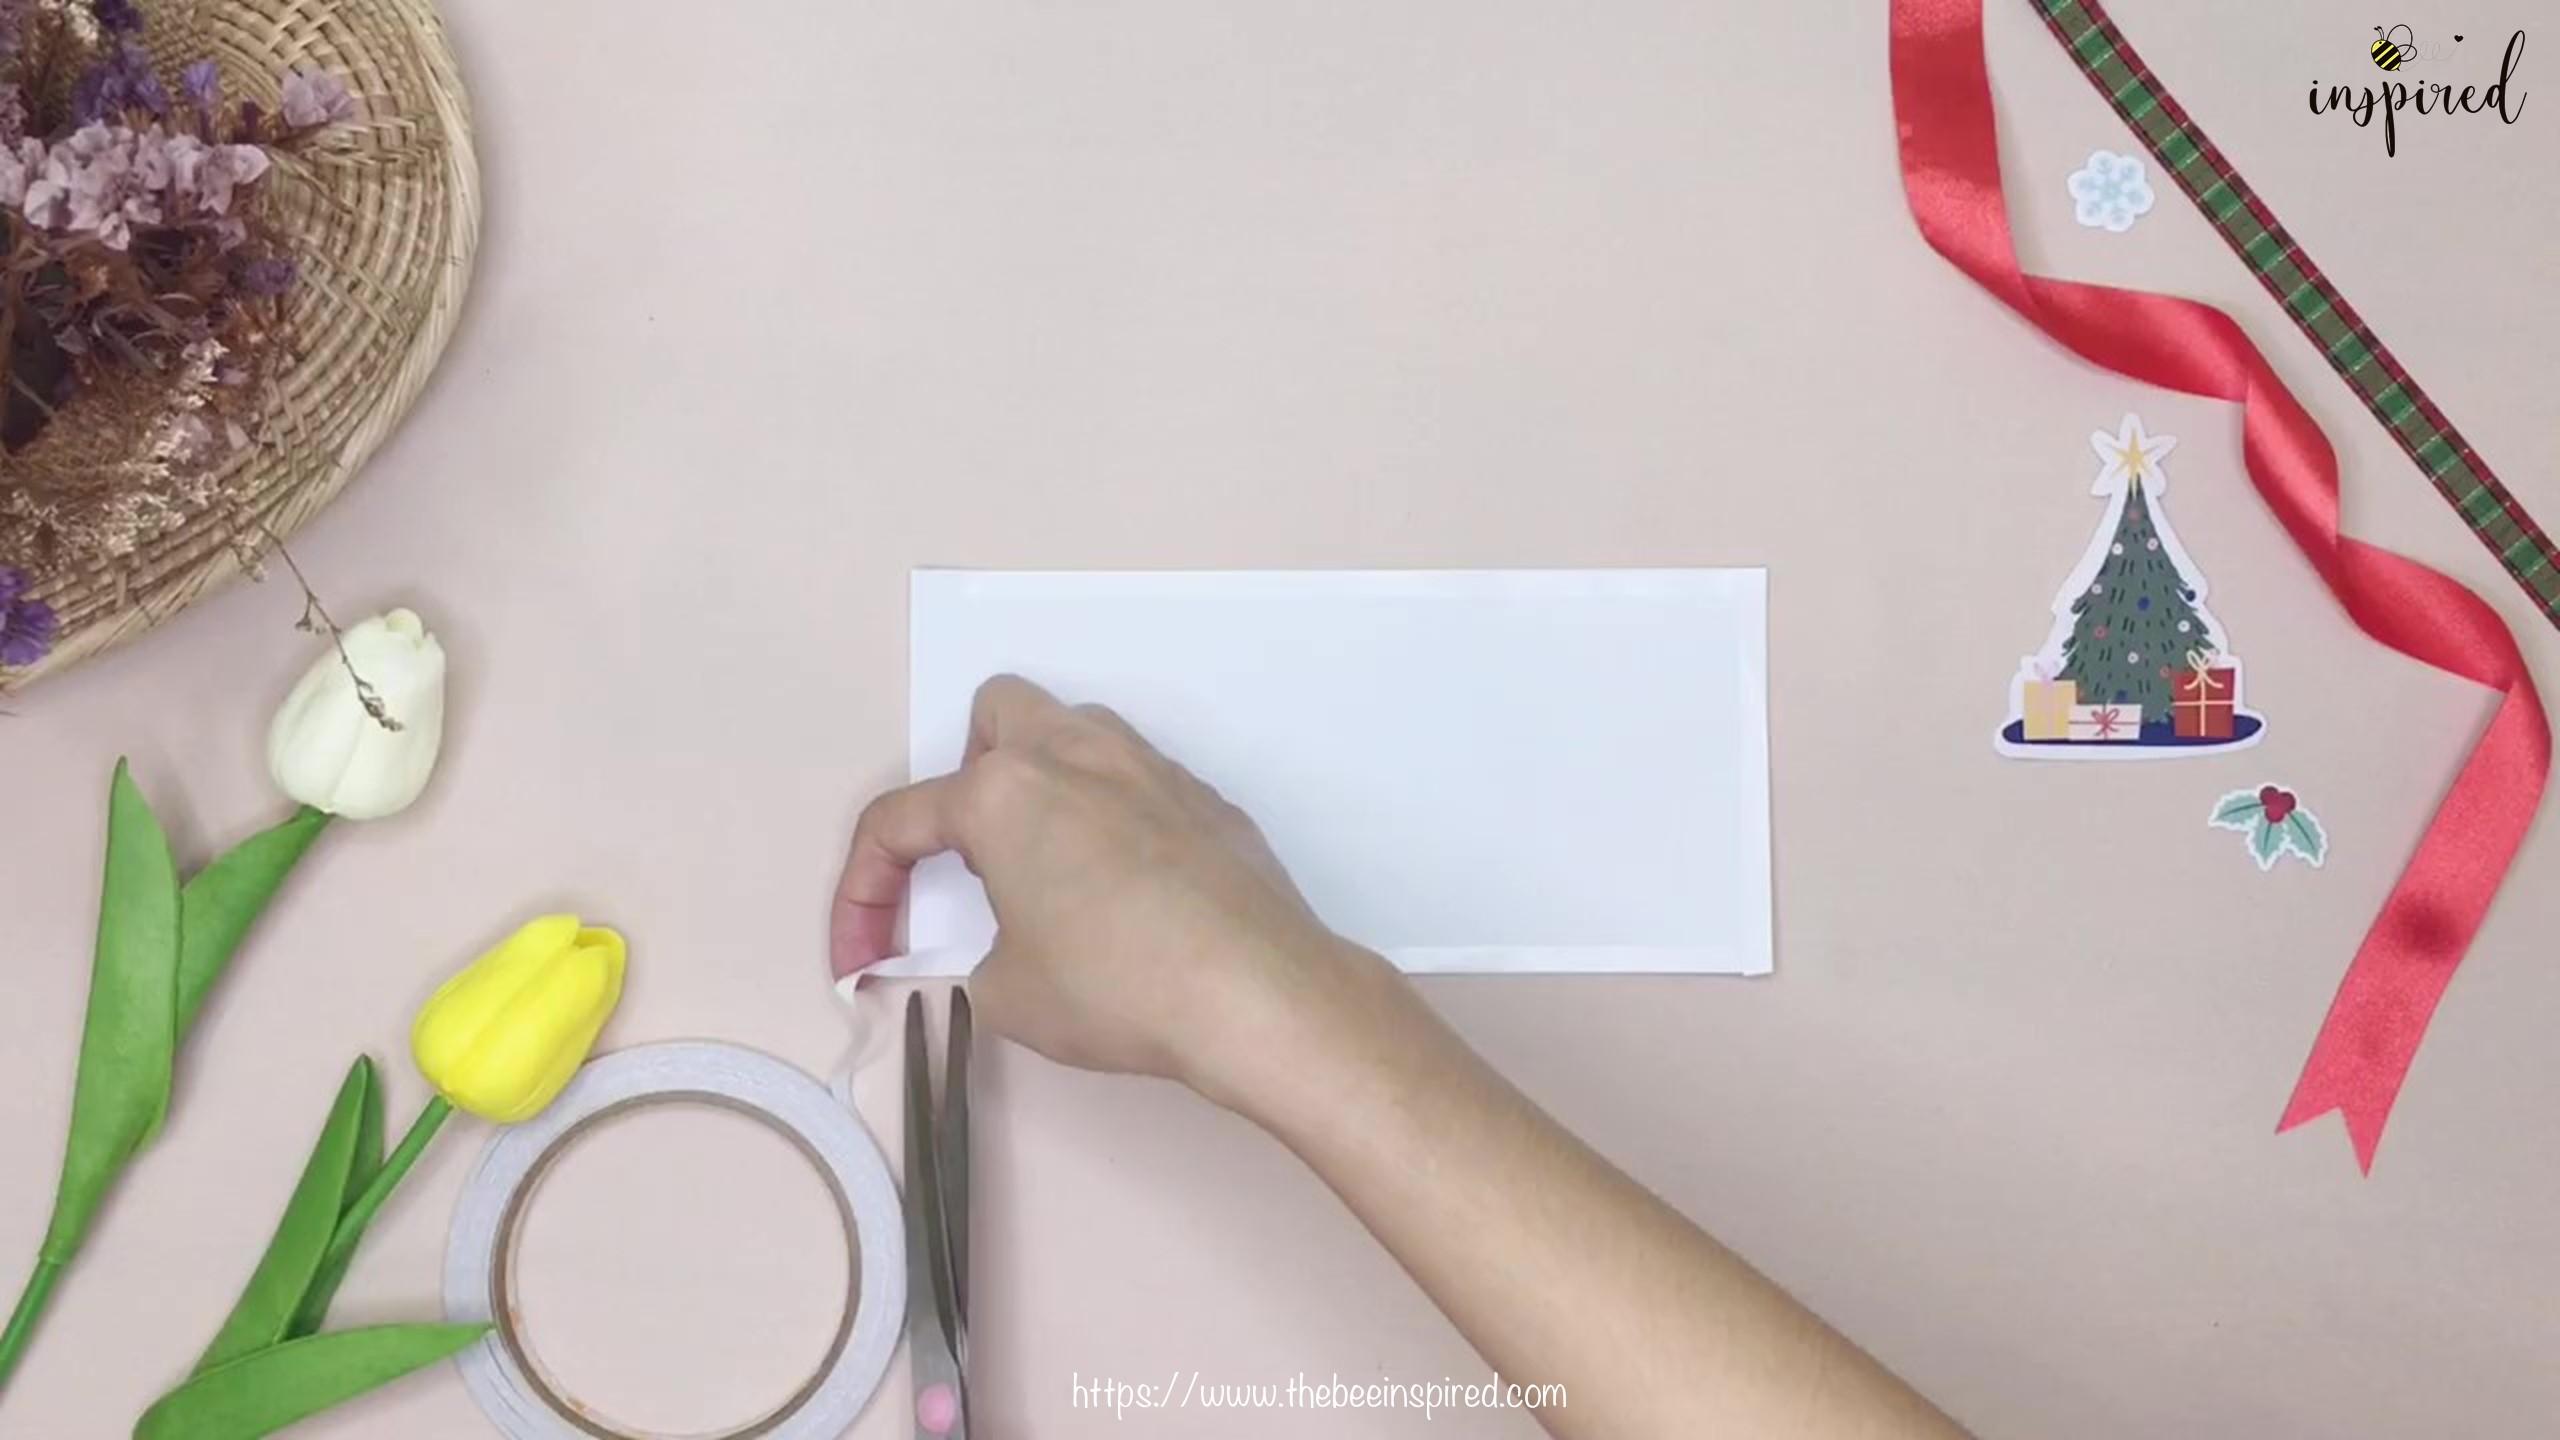 DIY วิธีทำถุงของขวัญวันวาเลนไทน์สามเหลี่ยม_ How to Wrap Gift in Triangle Shape for Valentine_2